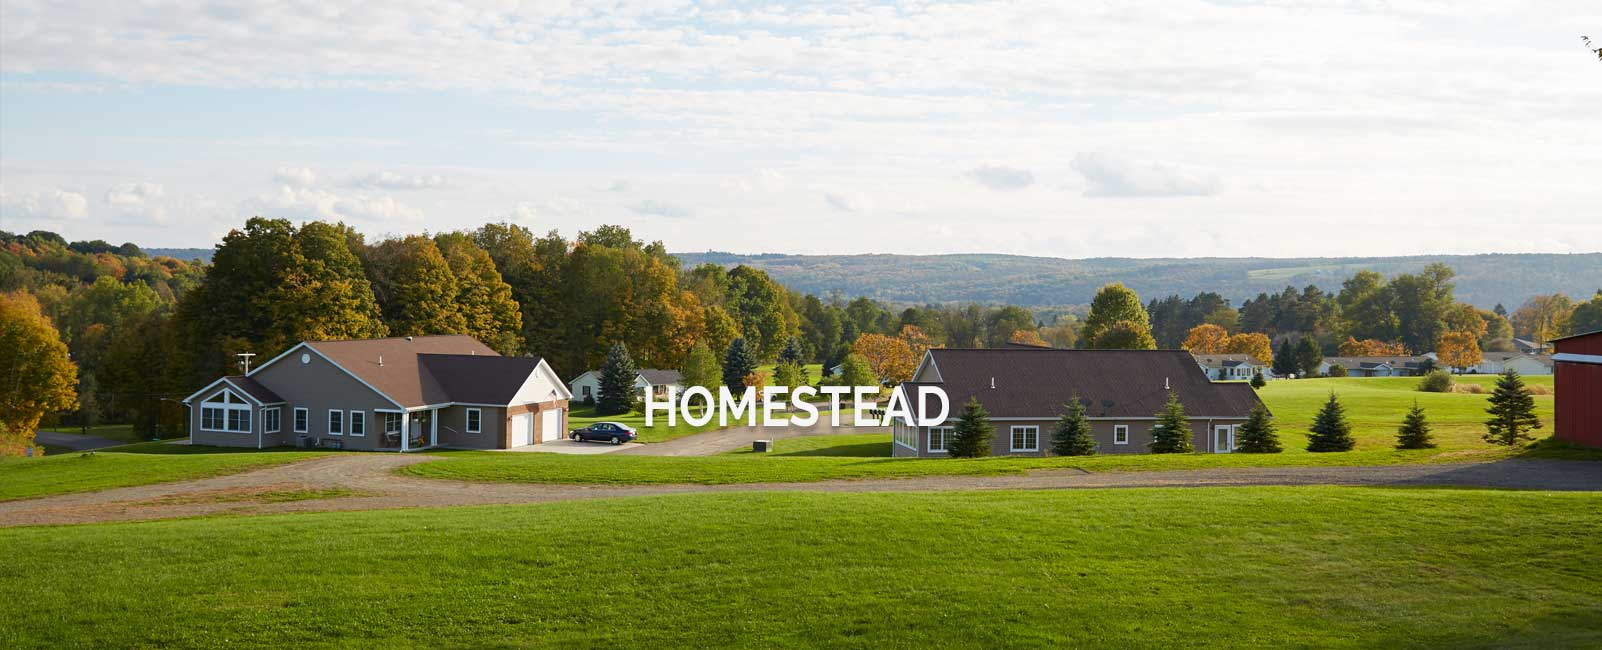 homestead-independent-living-retirement-housing-western-new-york